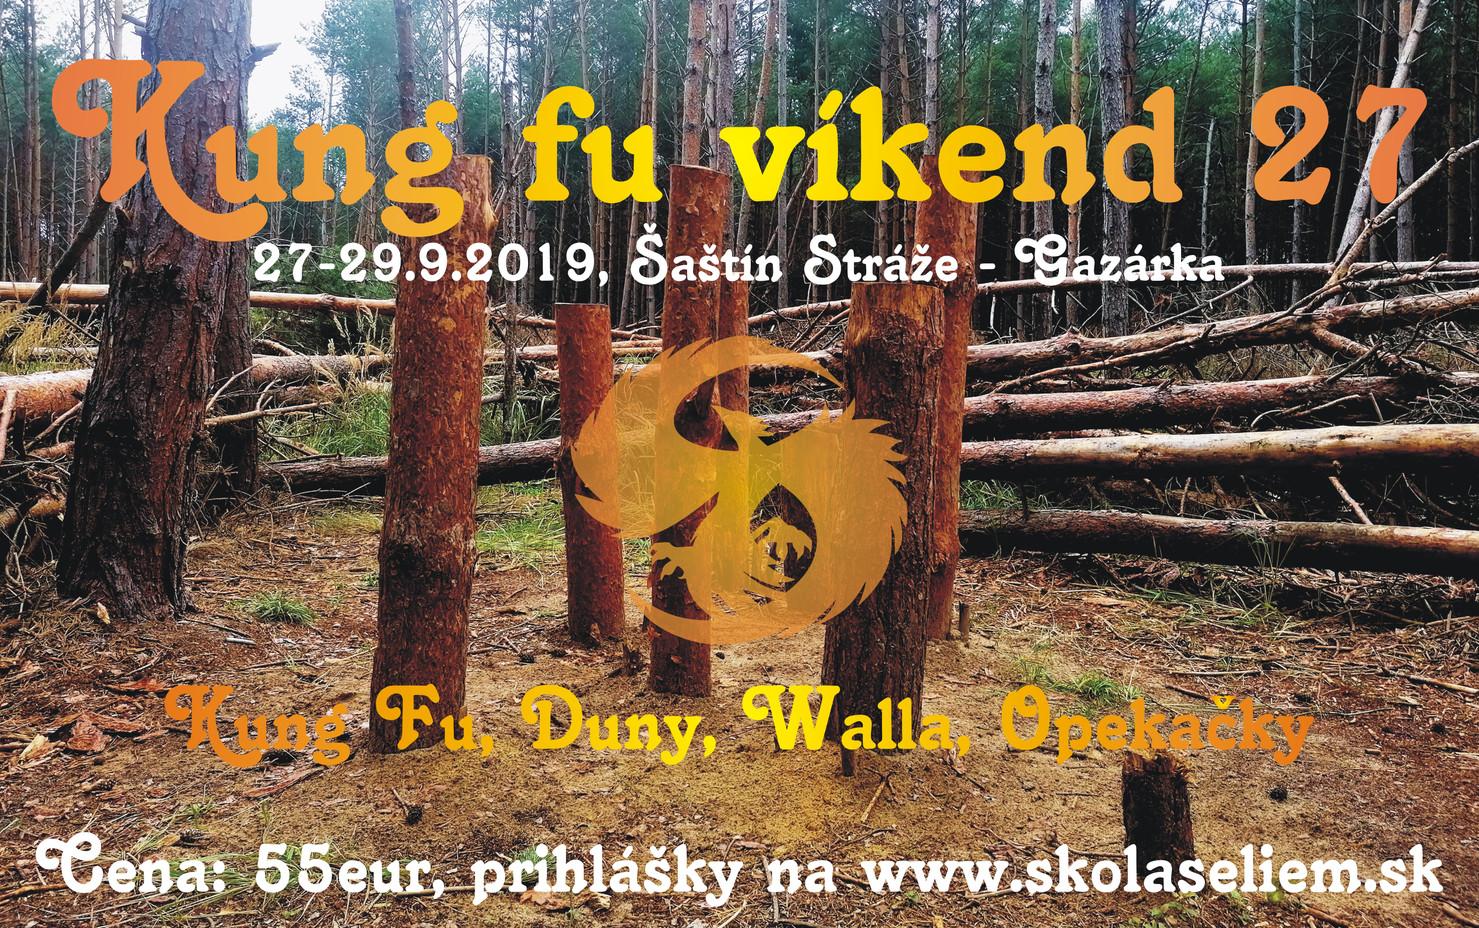 Kung fu víkend 27